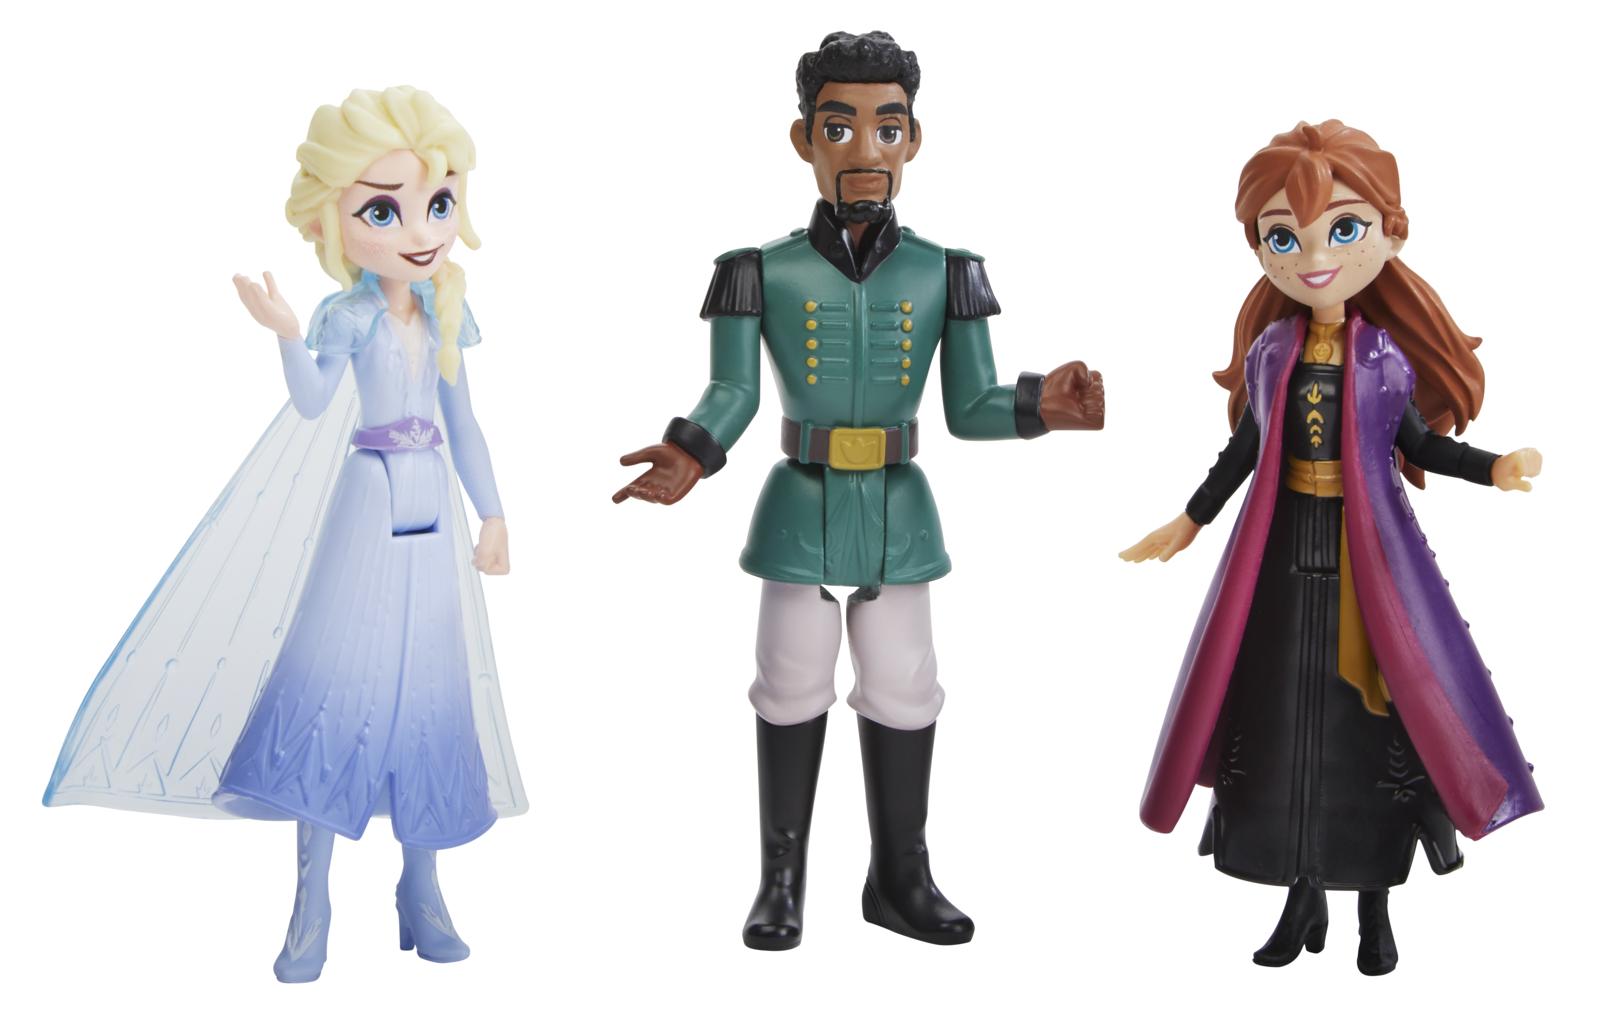 Frozen II: Elsa, Anna & Mattias - Story Moment Set image